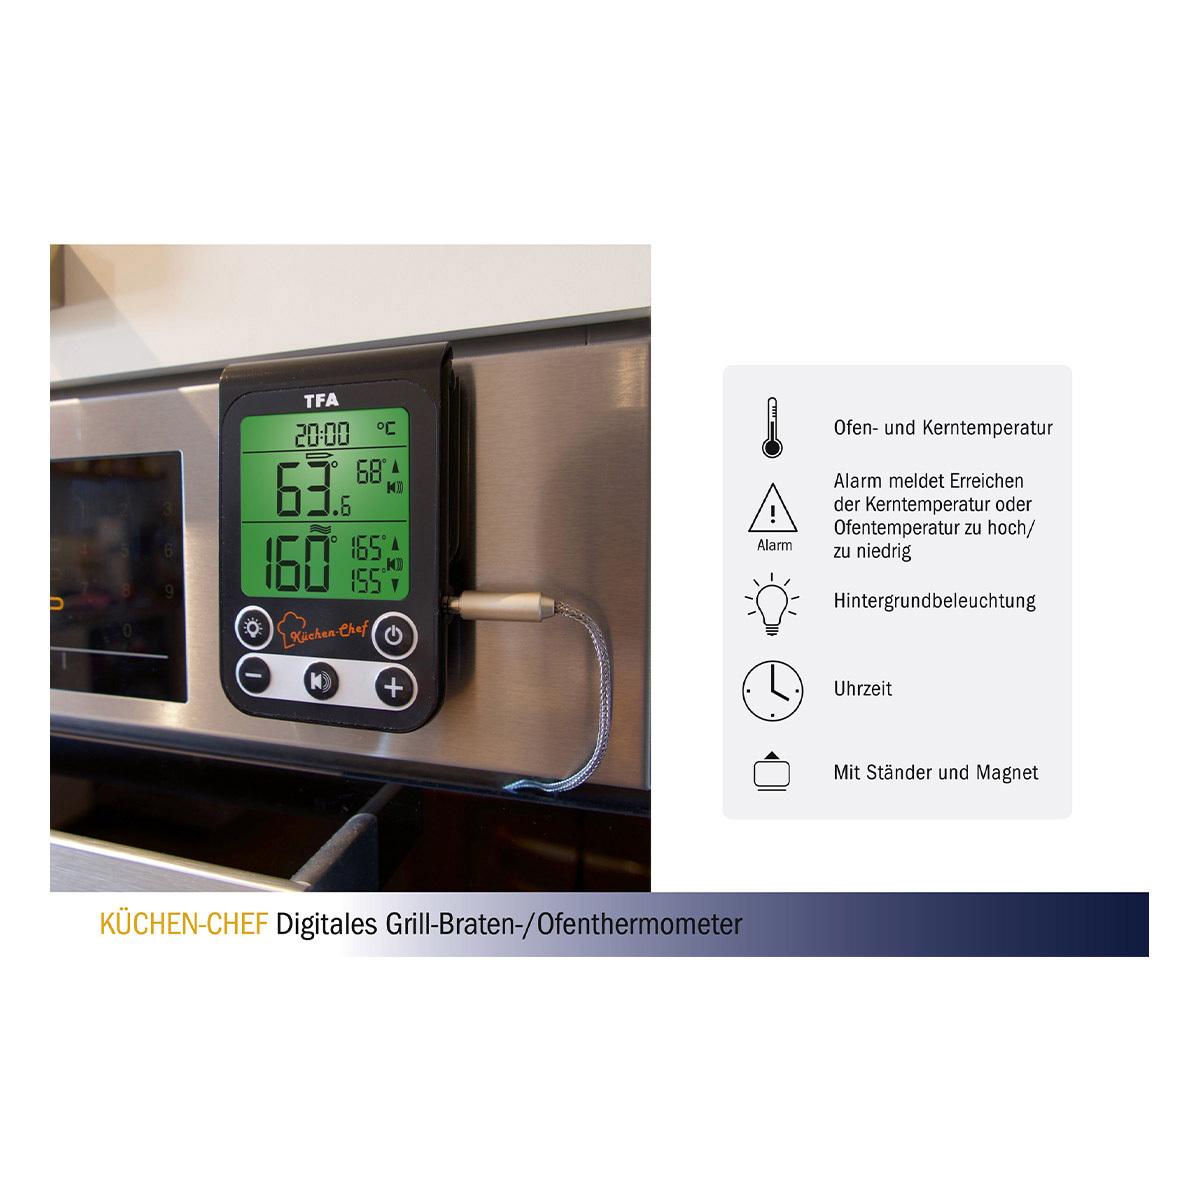 14-1512-01-digitales-grill-braten-ofenthermometer-küchen-chef-icons-1200x1200px.jpg